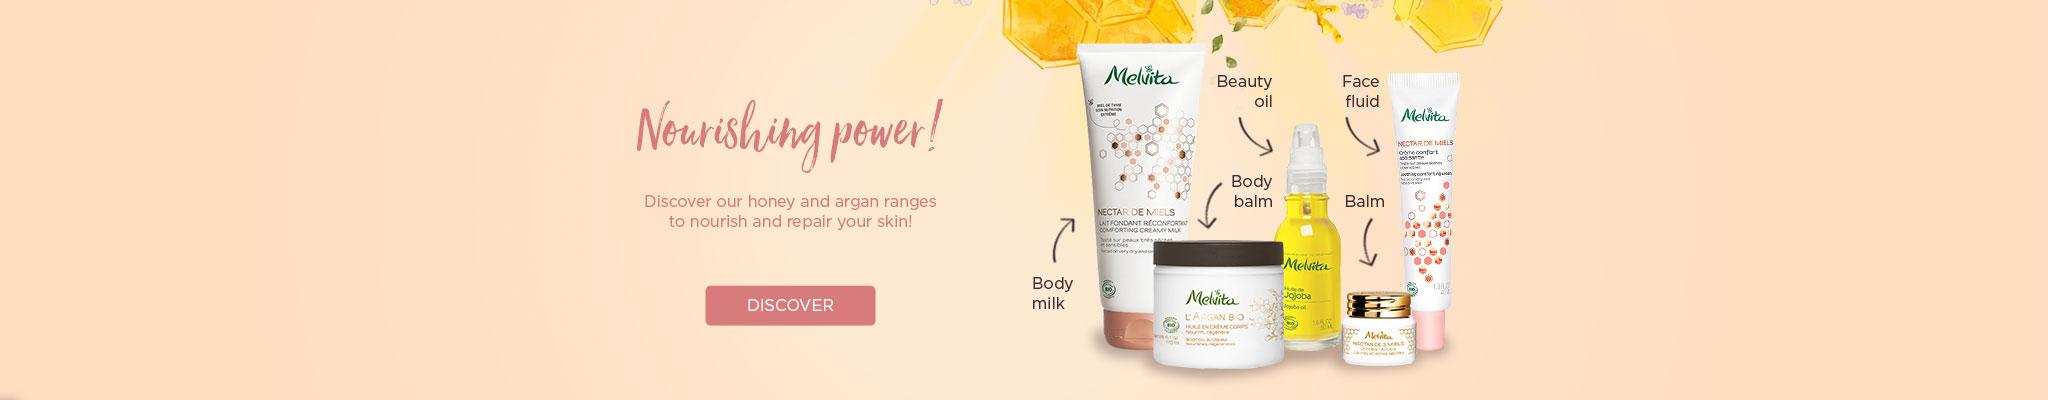 Nectar de Miel Nutrition